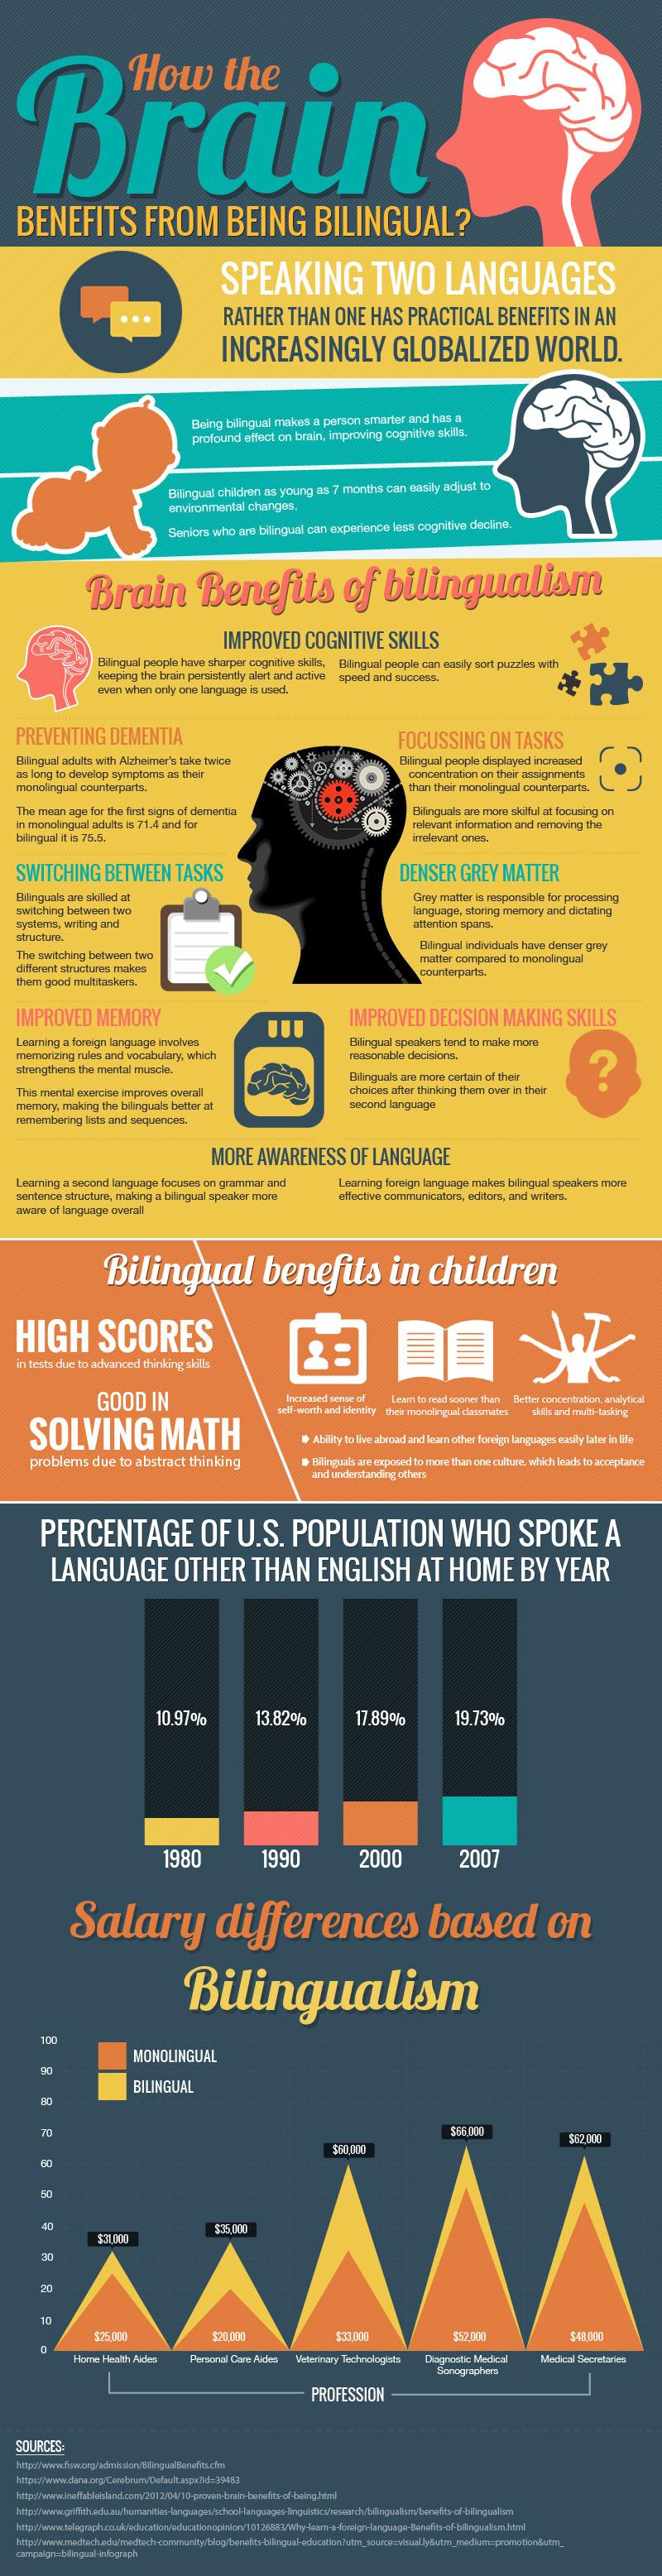 bilingual benefits infographic